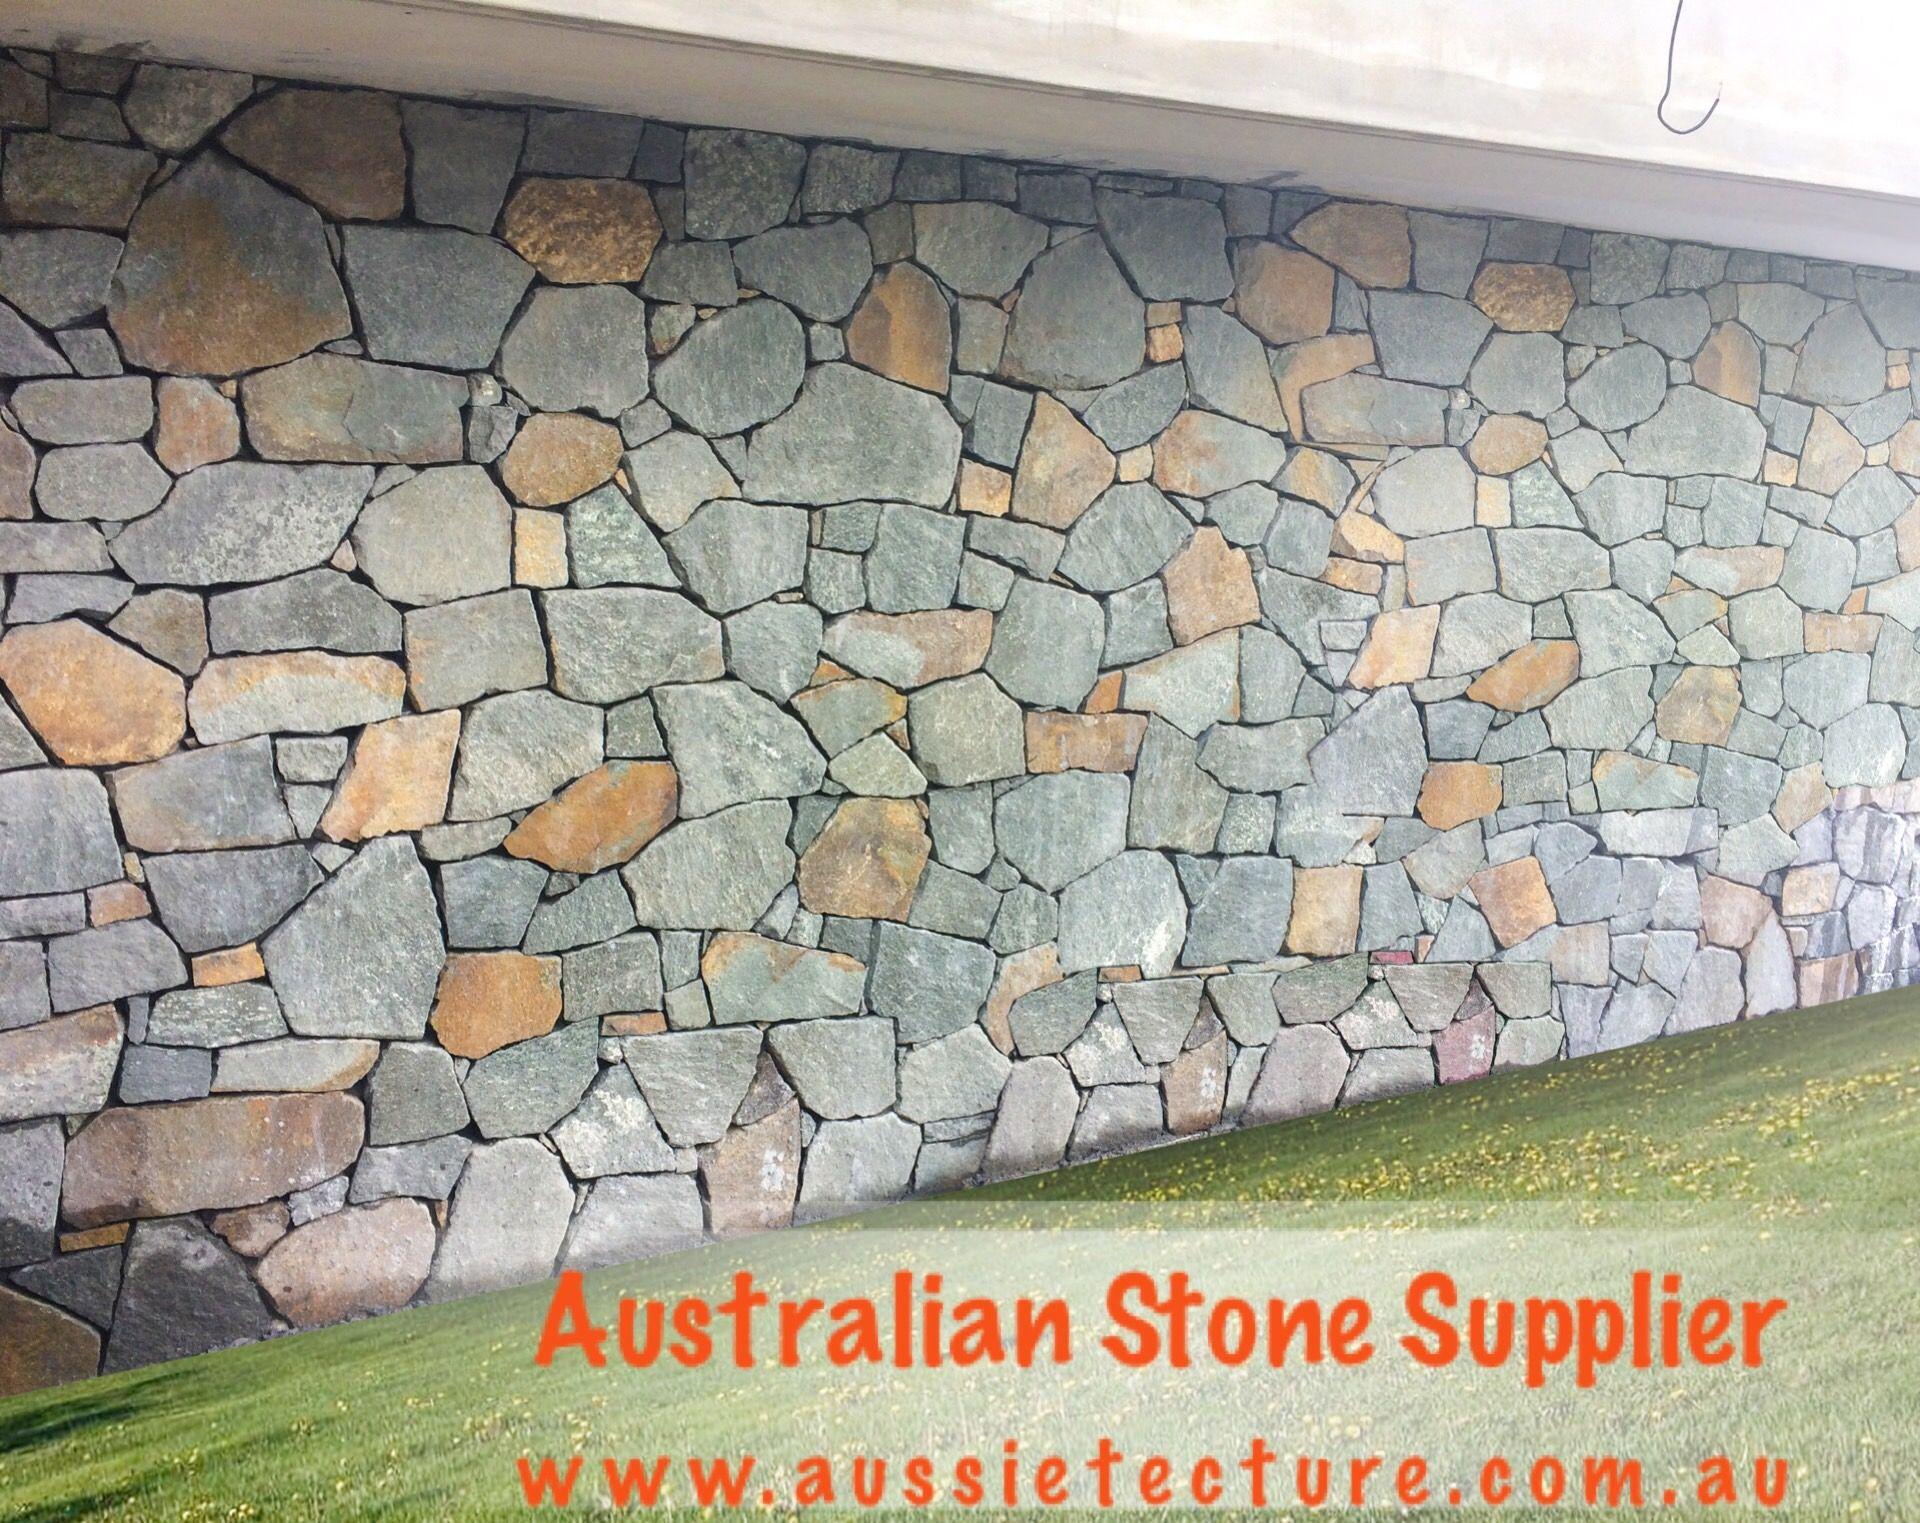 Stone Wall Stone Cladding Stone Walls Stone Walling Sone Wall Cladding Sandstone Stone Cladding Stone Wall Cladding Natural Stone Cladding Stone Cladding